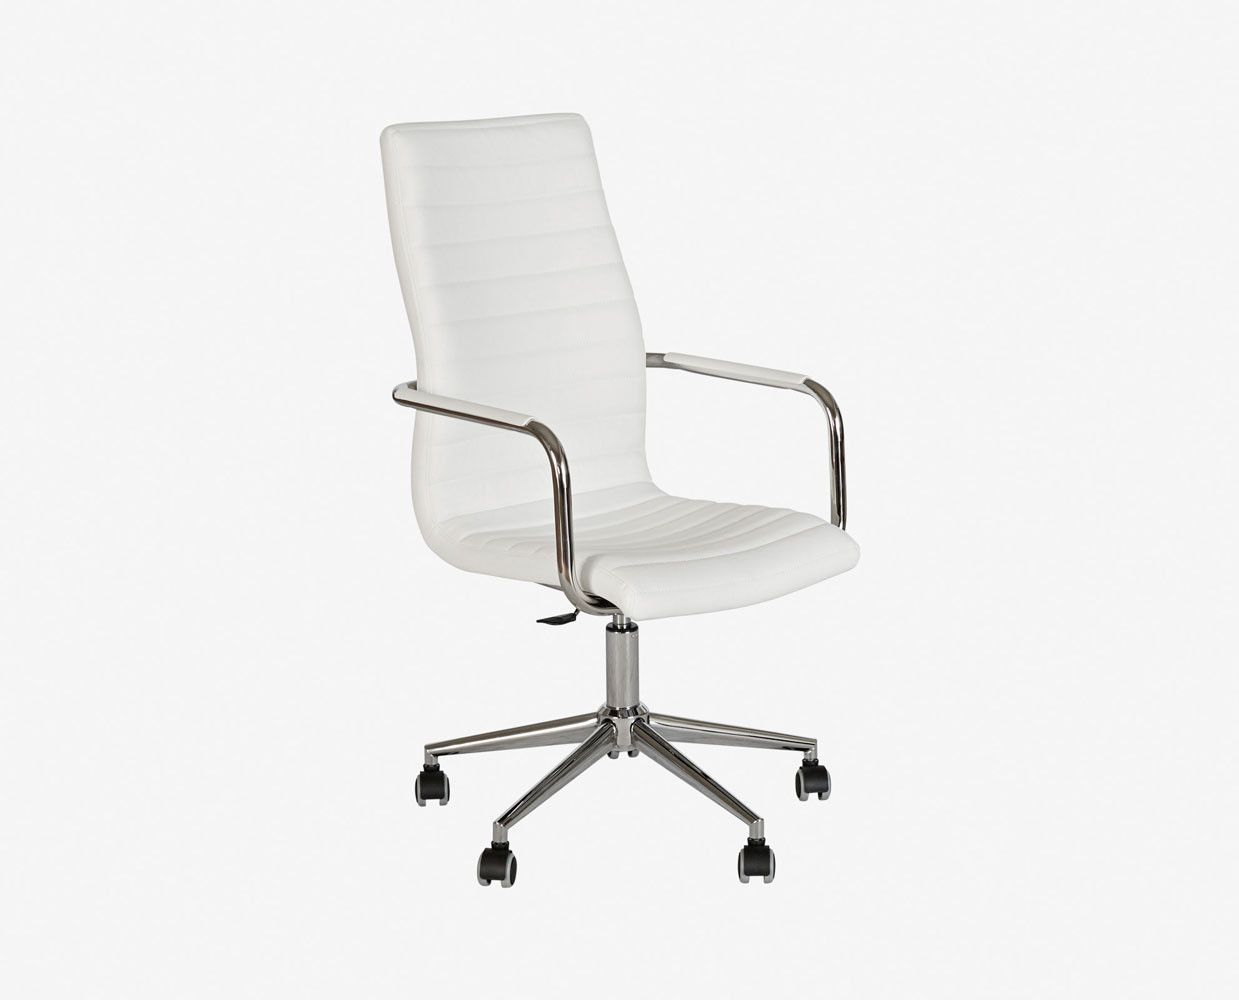 Kontor High Back Desk Chair  Chair, Teak dining chairs